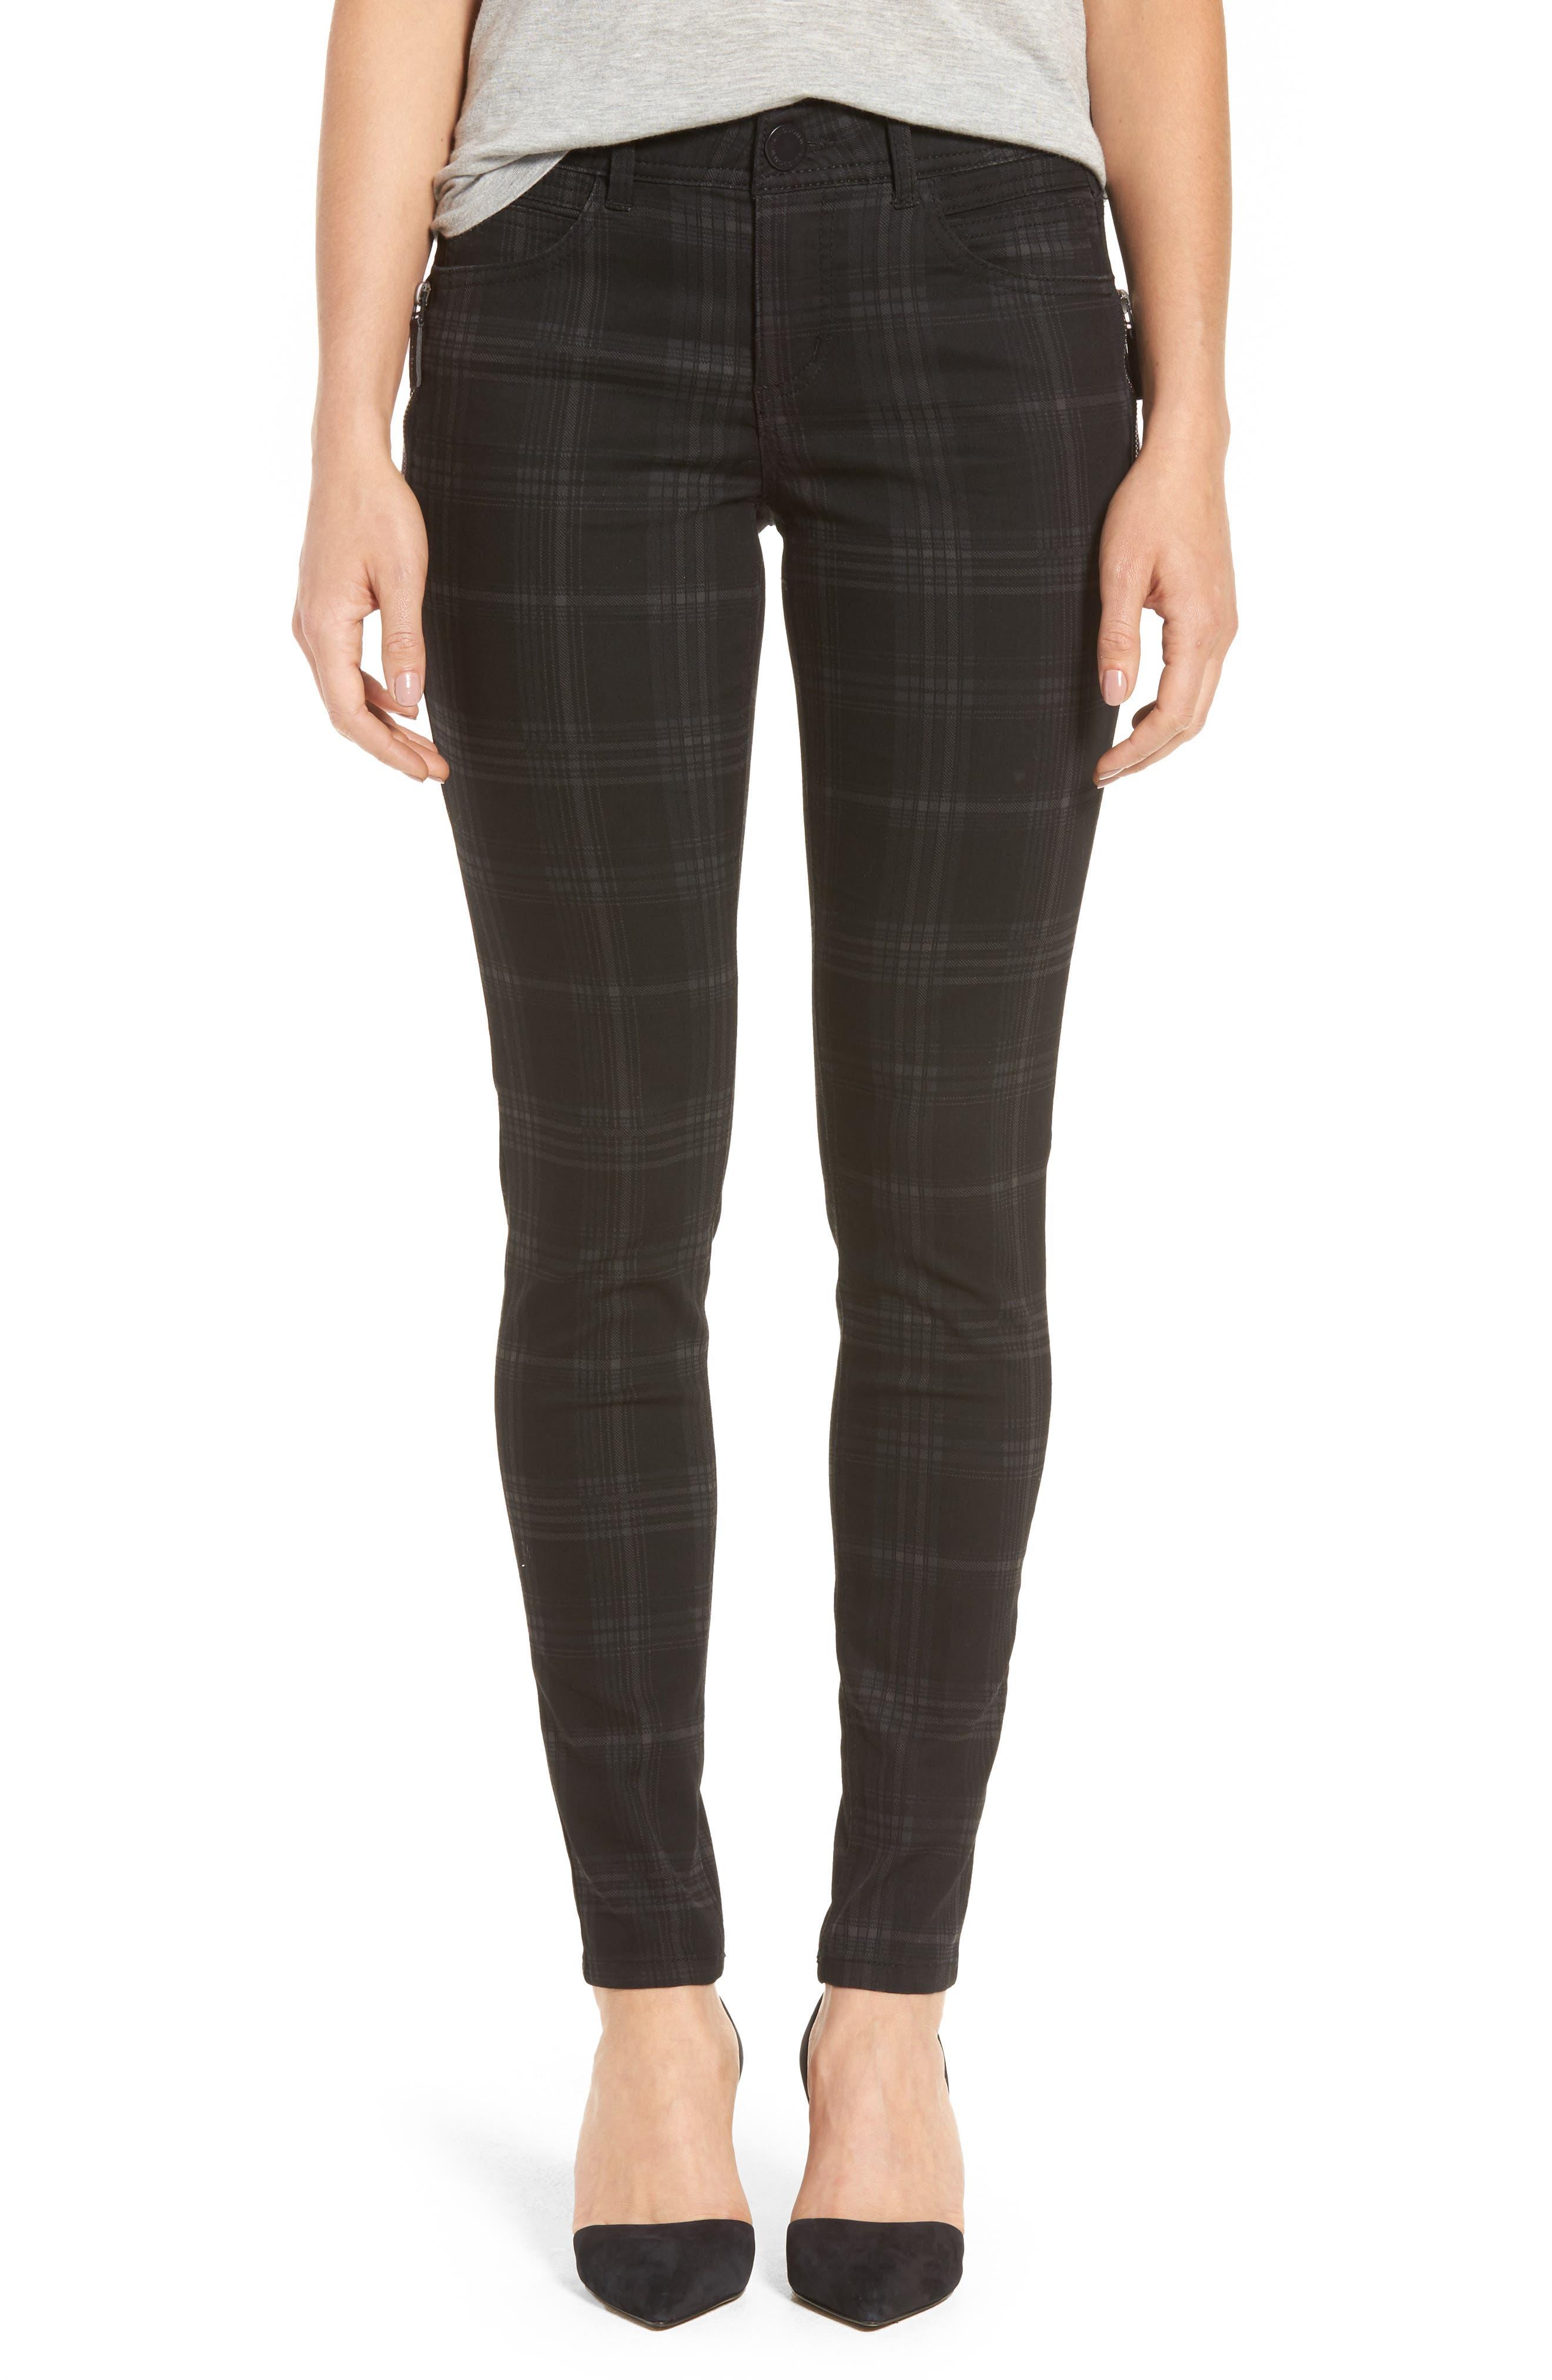 Ab-solution Side Zip Plaid Skinny Pants,                         Main,                         color, Black